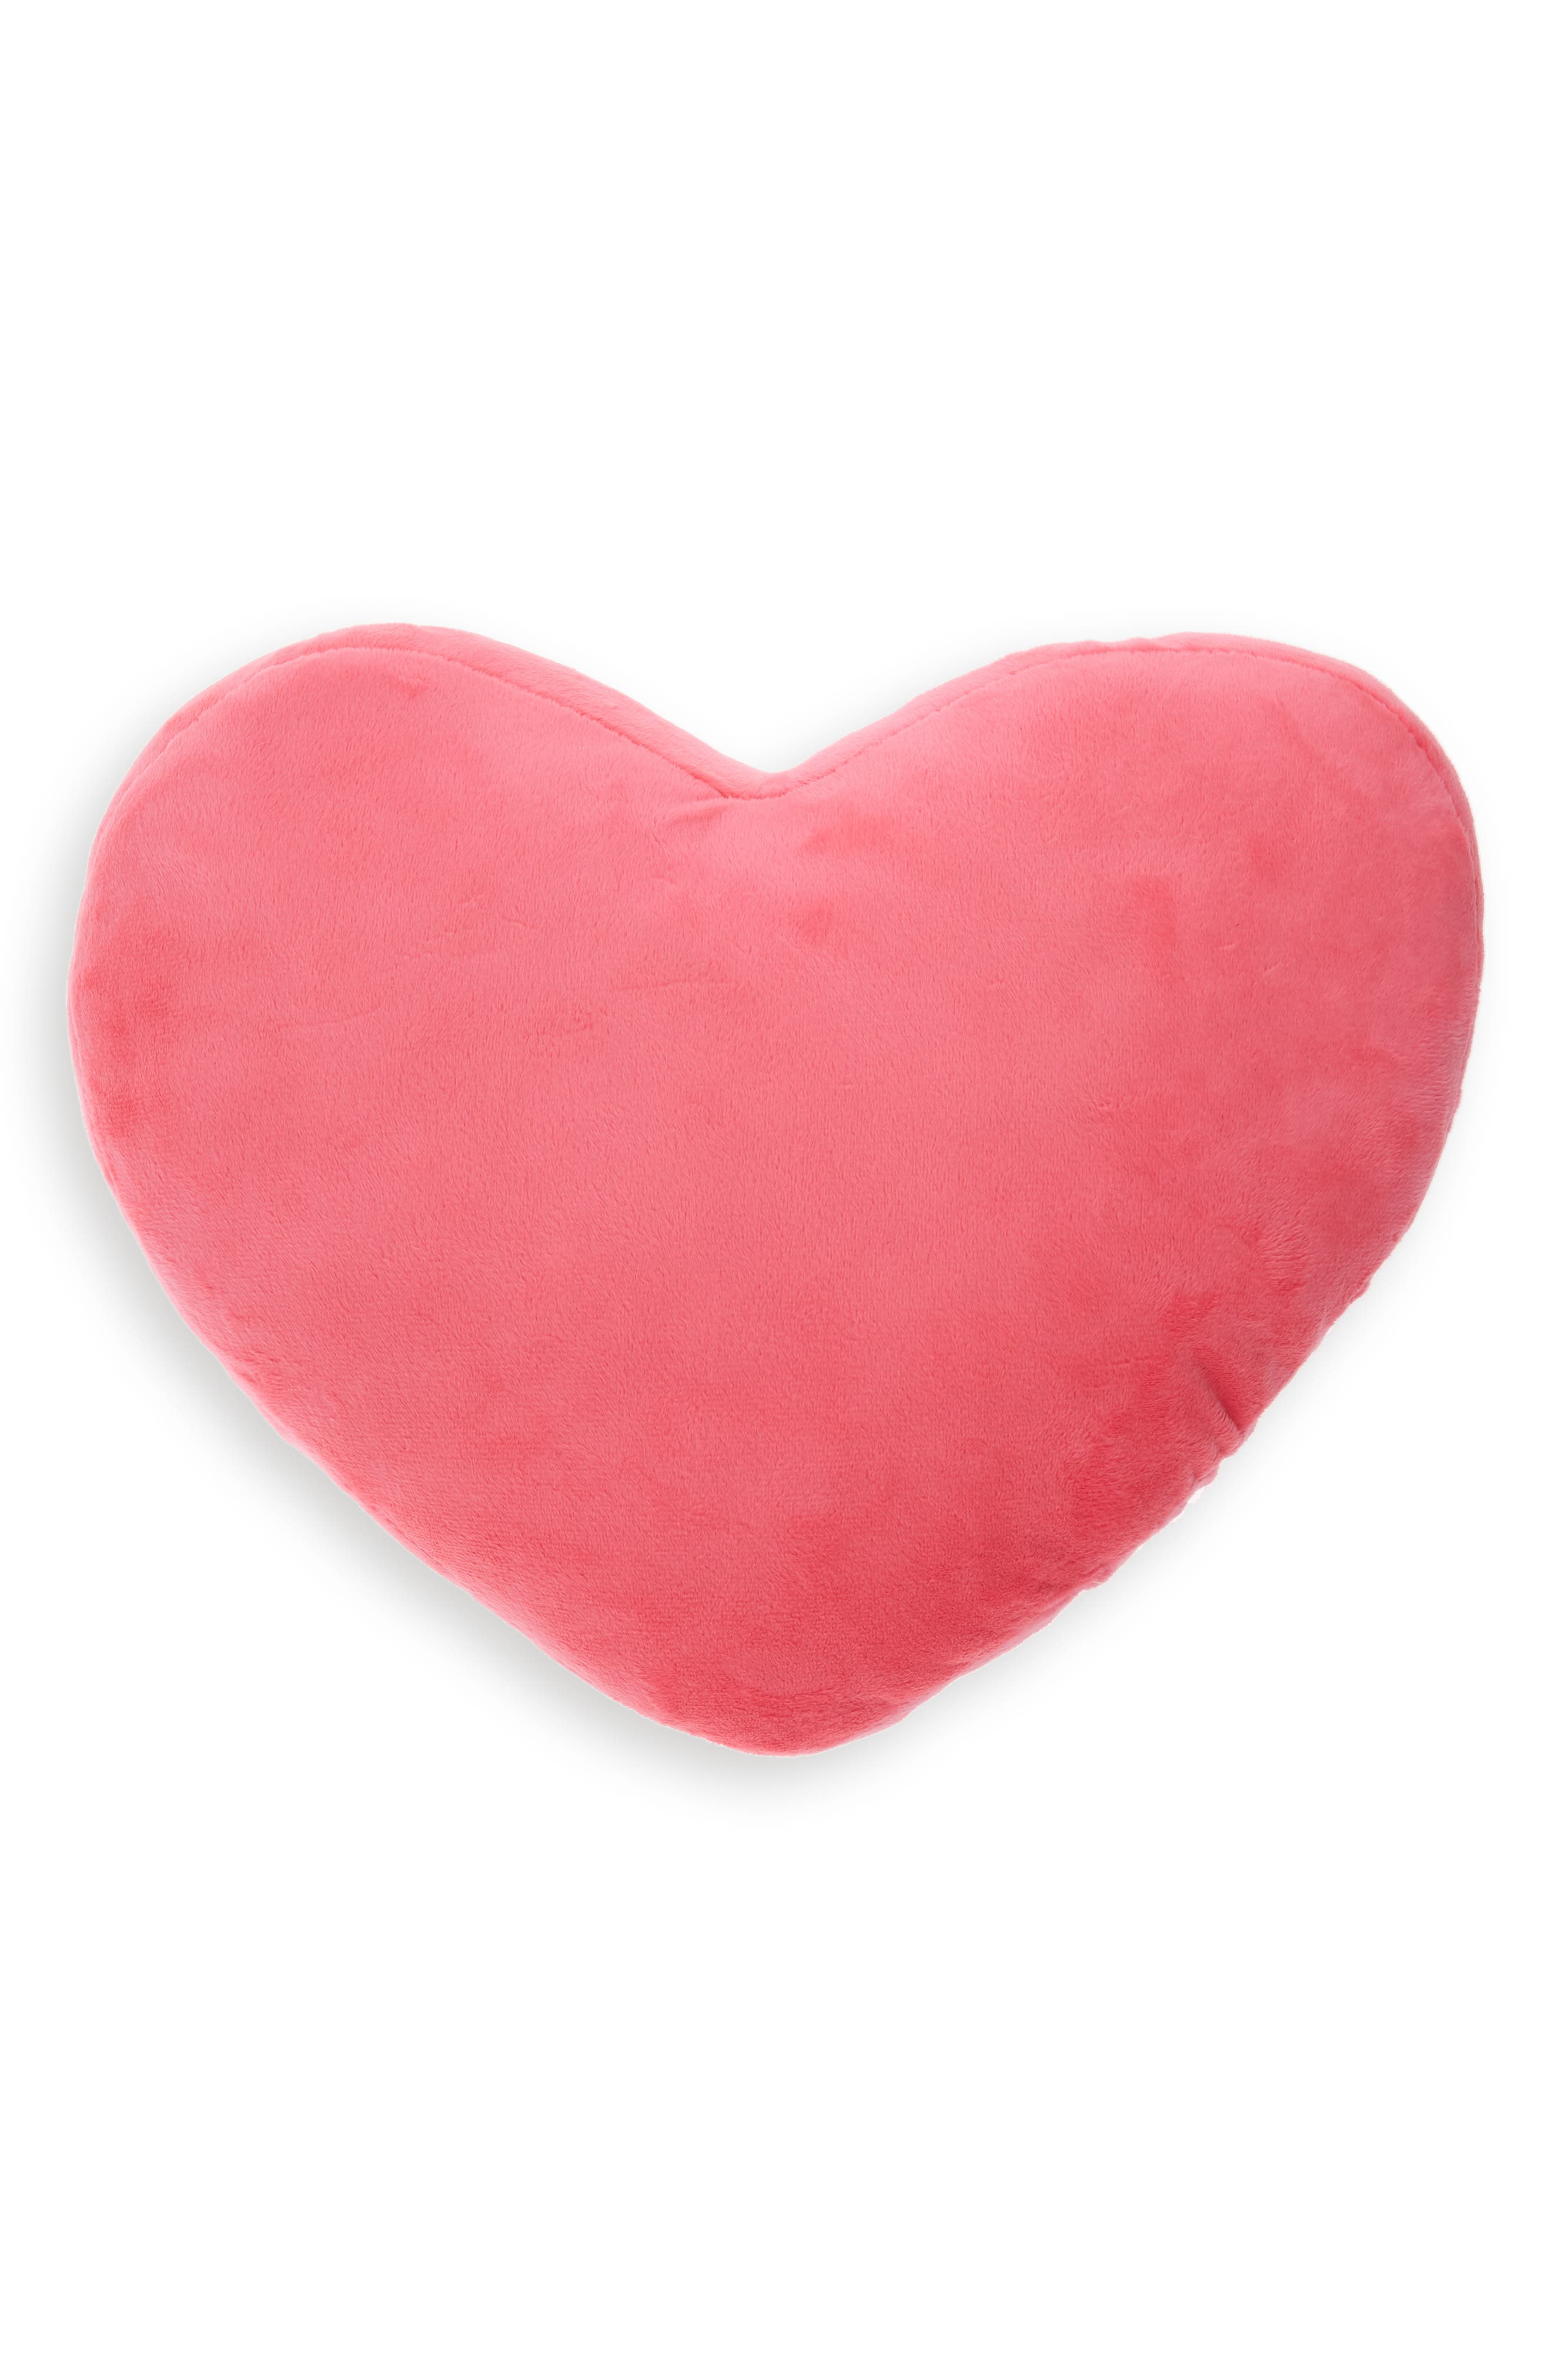 CAPELLI NEW YORK,                             Reversible Sequin Heart Pillow,                             Alternate thumbnail 2, color,                             PINK COMBO